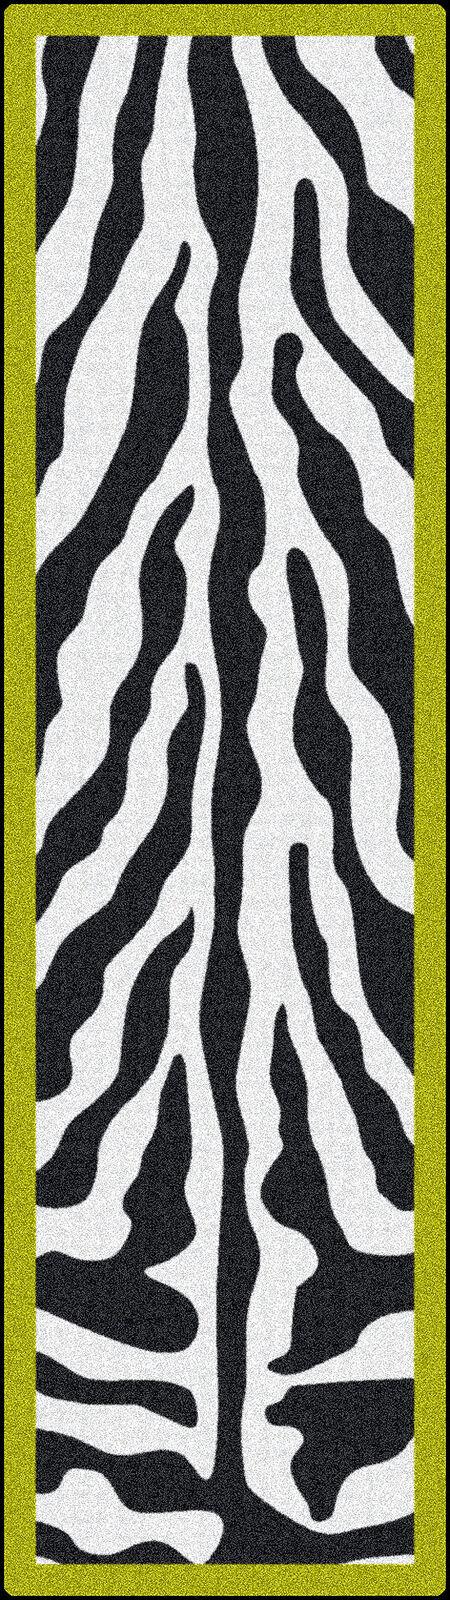 2x8 Milliken Zebra Glam Citrus Animal Print Area Rug - Approx 2'1 x7'8